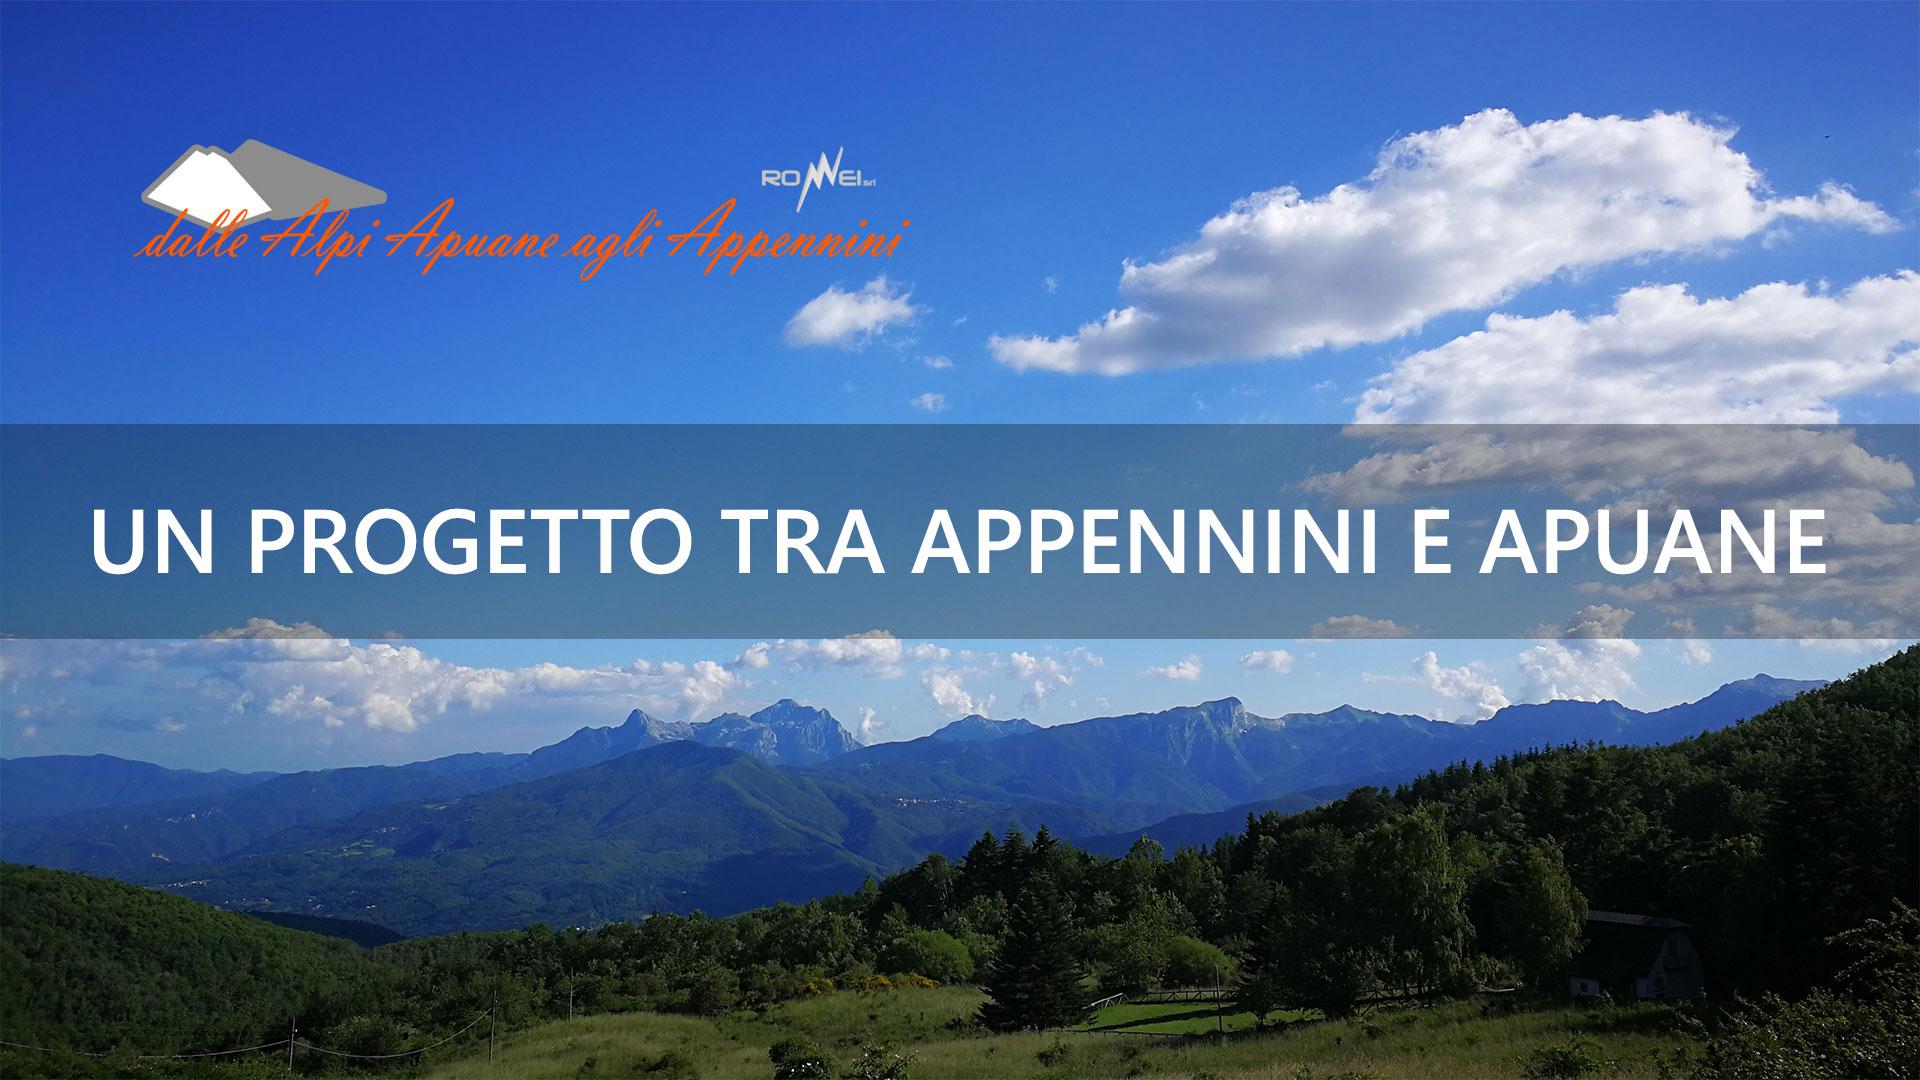 Home Slide Apuane Appennini